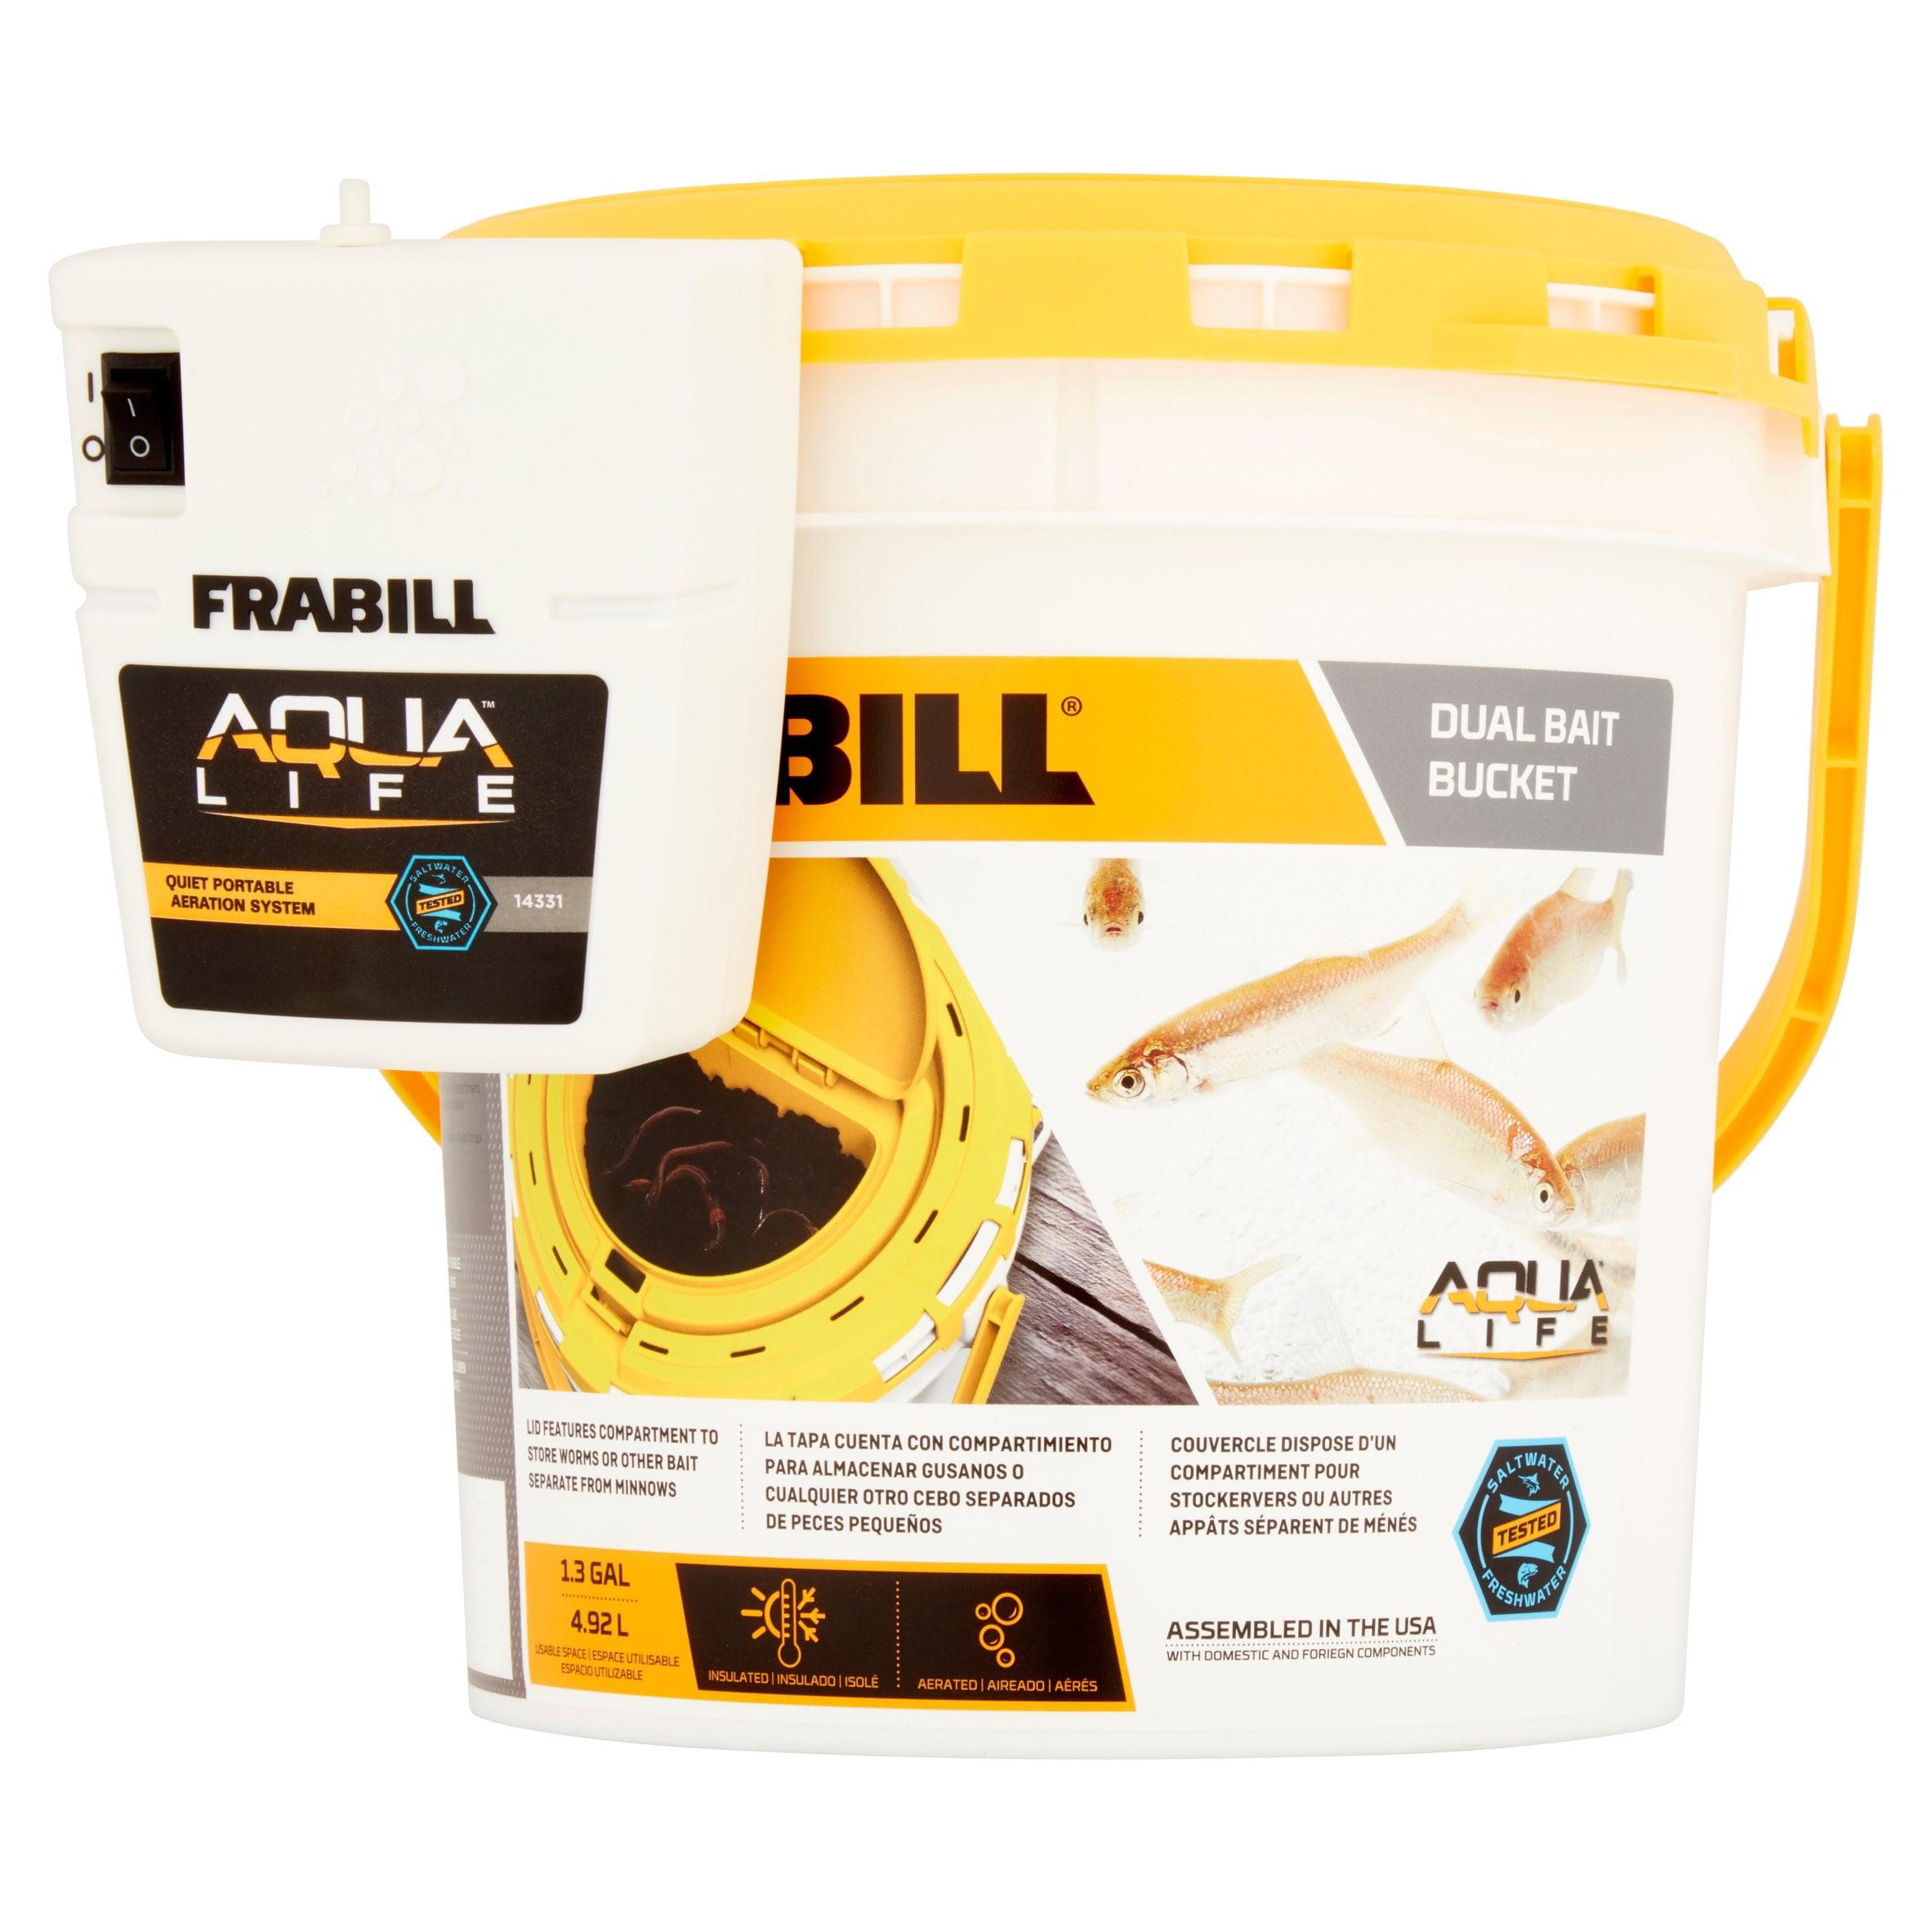 Frabill Aqua Life Dual Fish Bait Bucket with Clip on Aerator